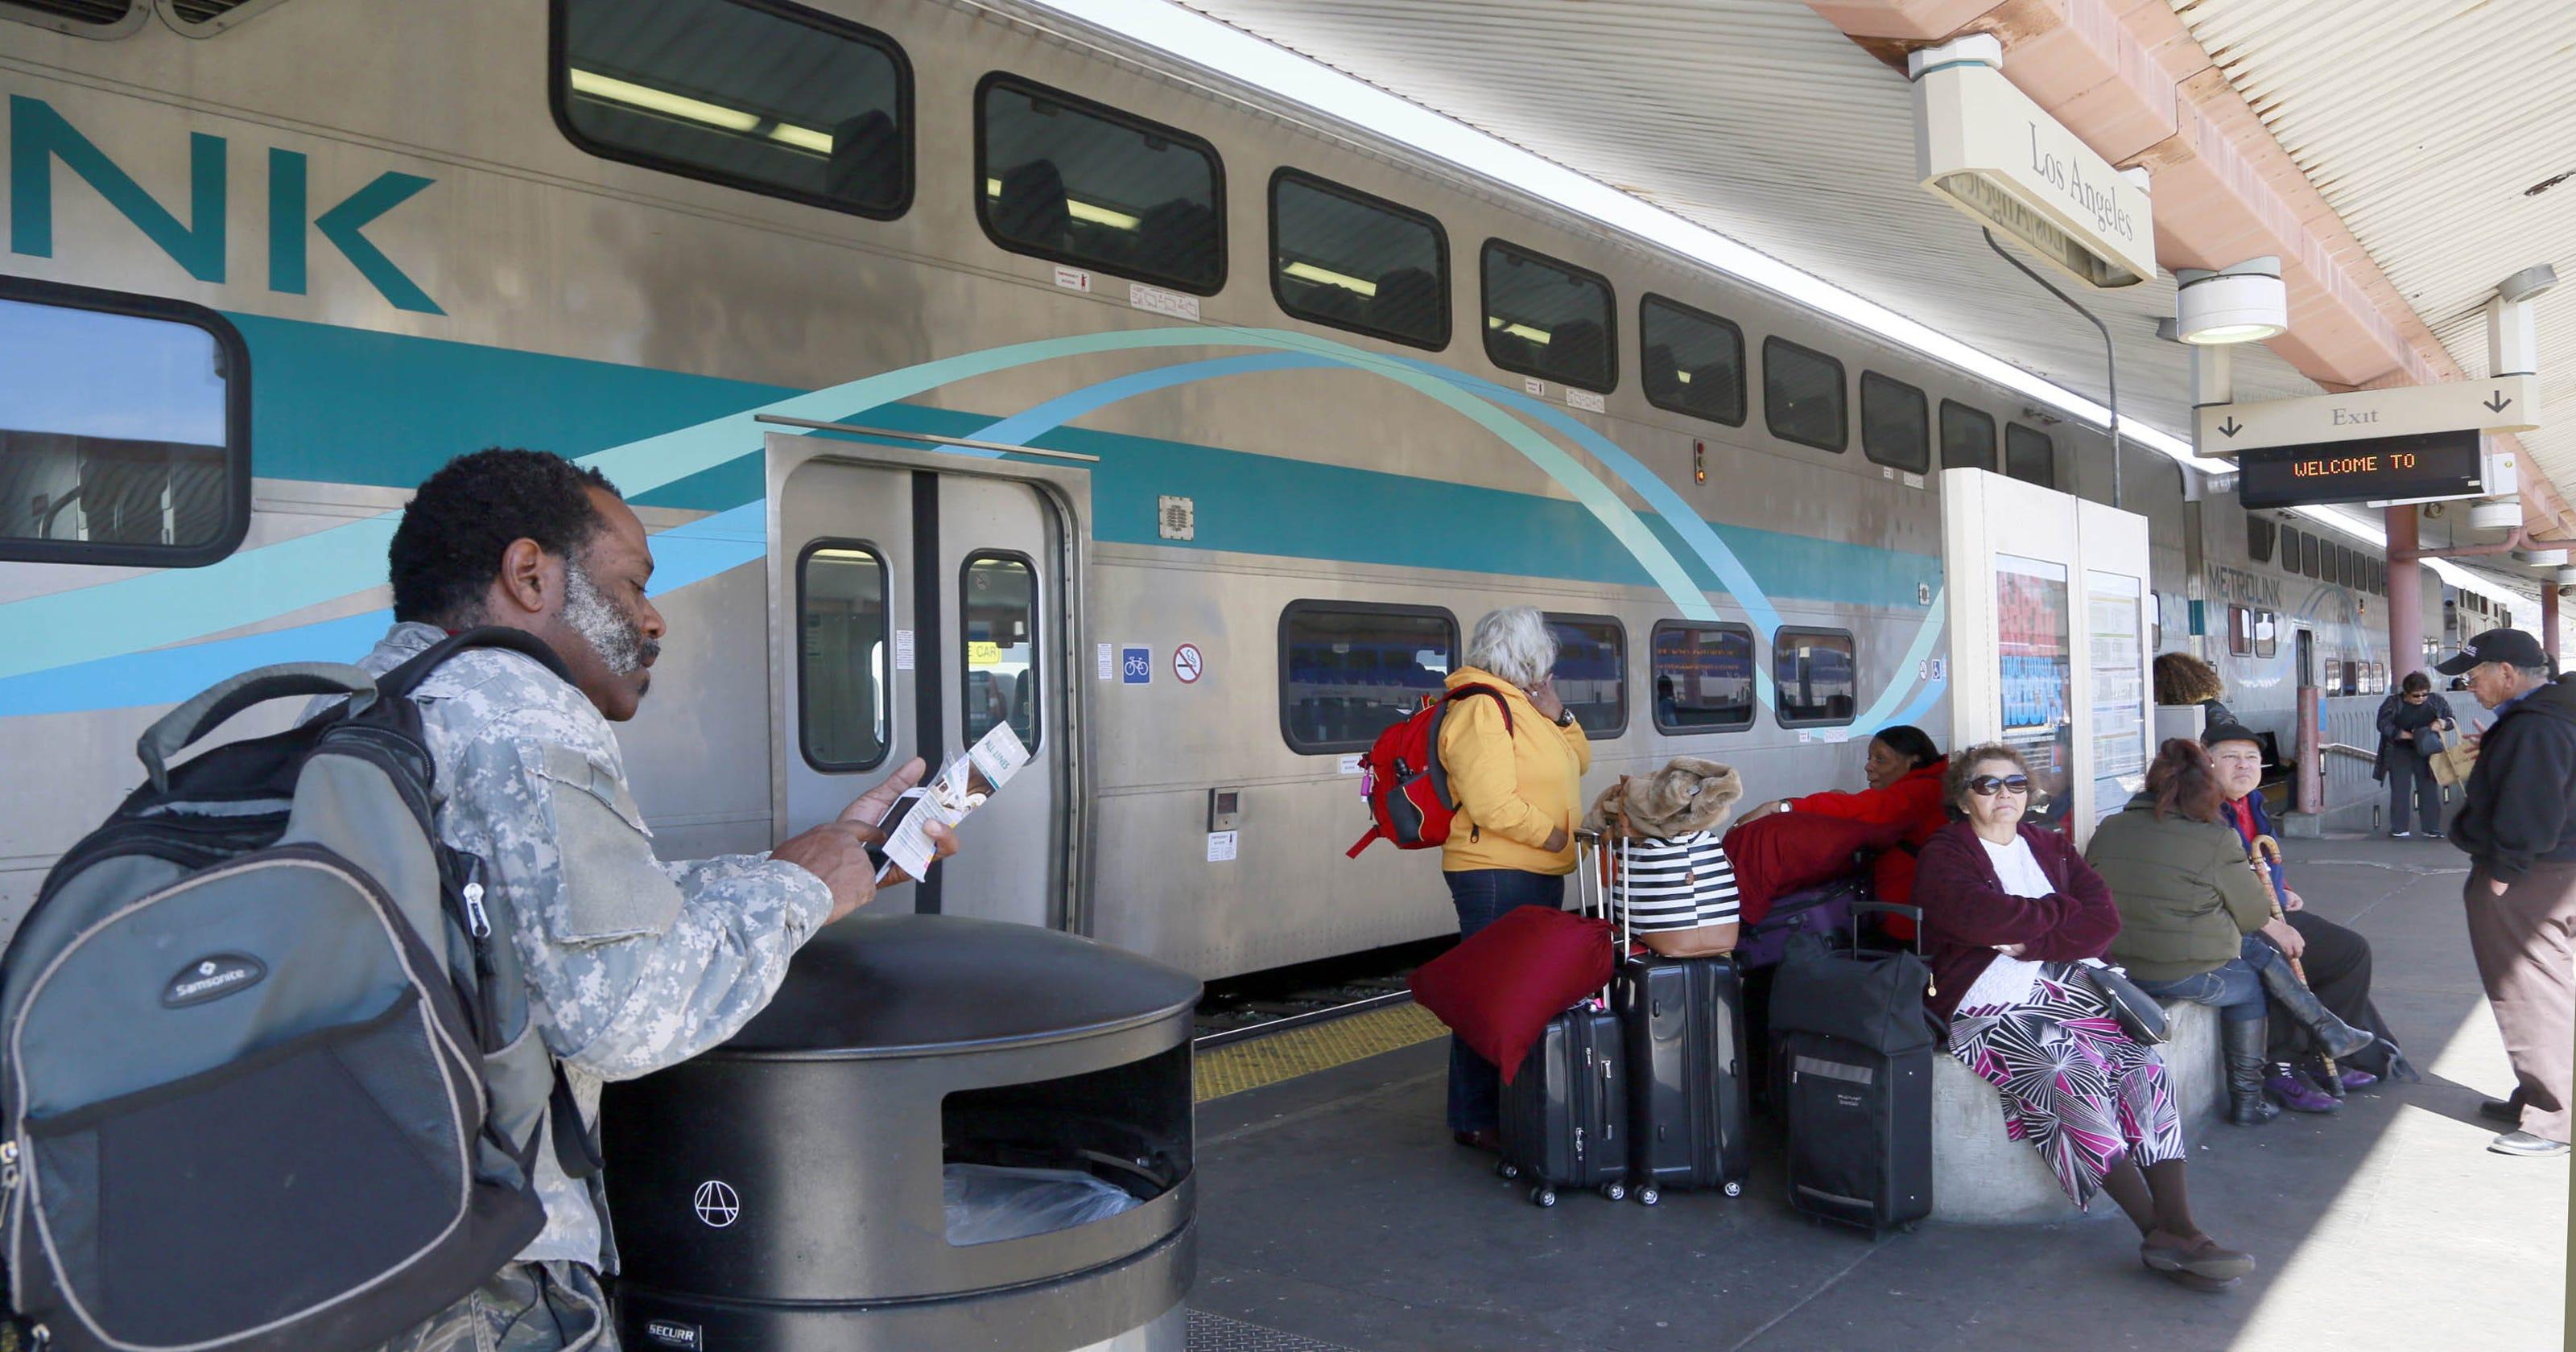 Metrolink extends to Moreno Valley